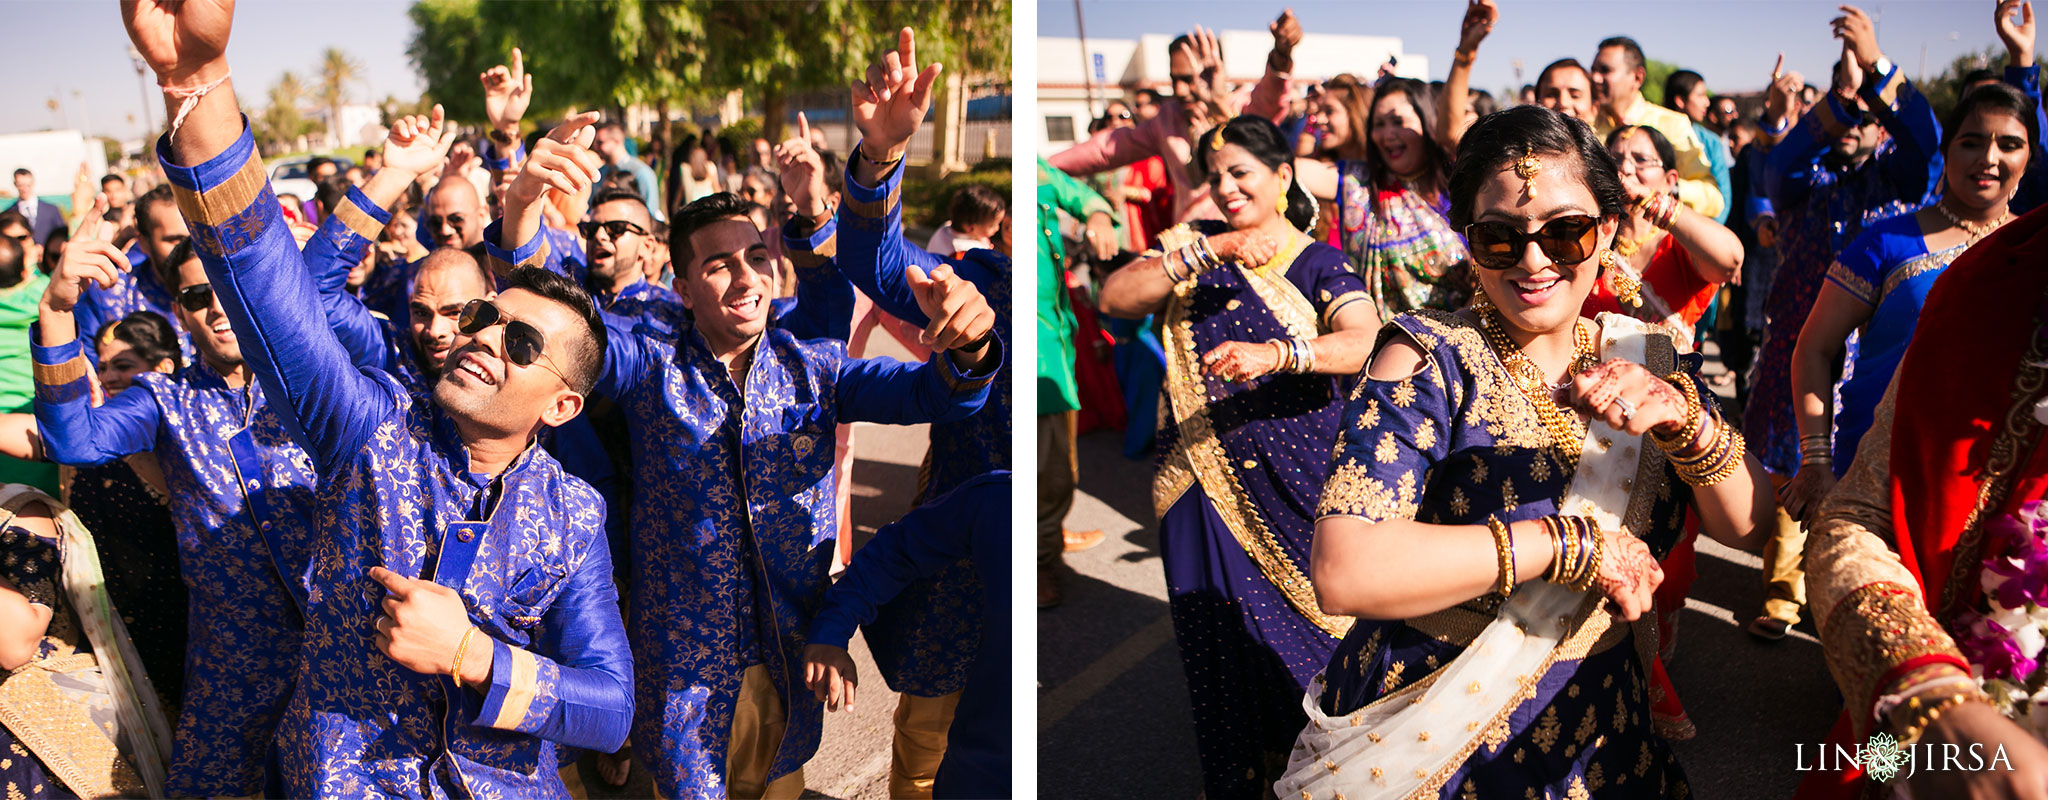 081 BAPS Swaminarayan Sanstha Chino Hills Indian Wedding Photography